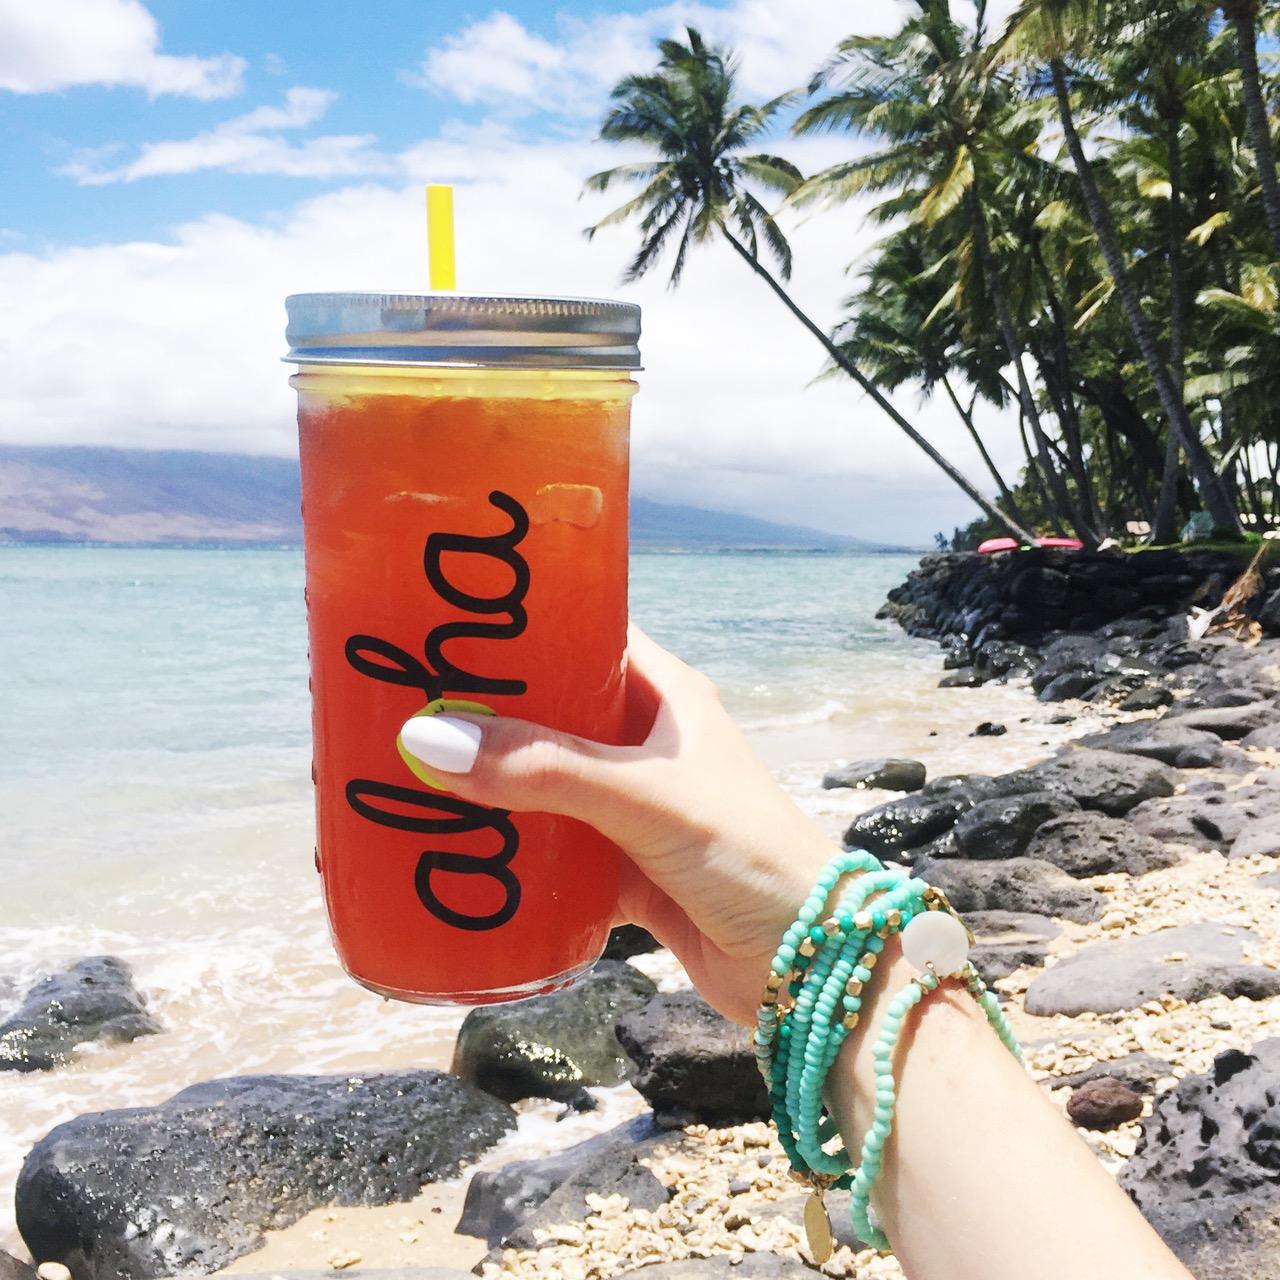 gourmet lemonades in mason jars from Wow Wow Hawaiian Lemonade in Kihei Maui